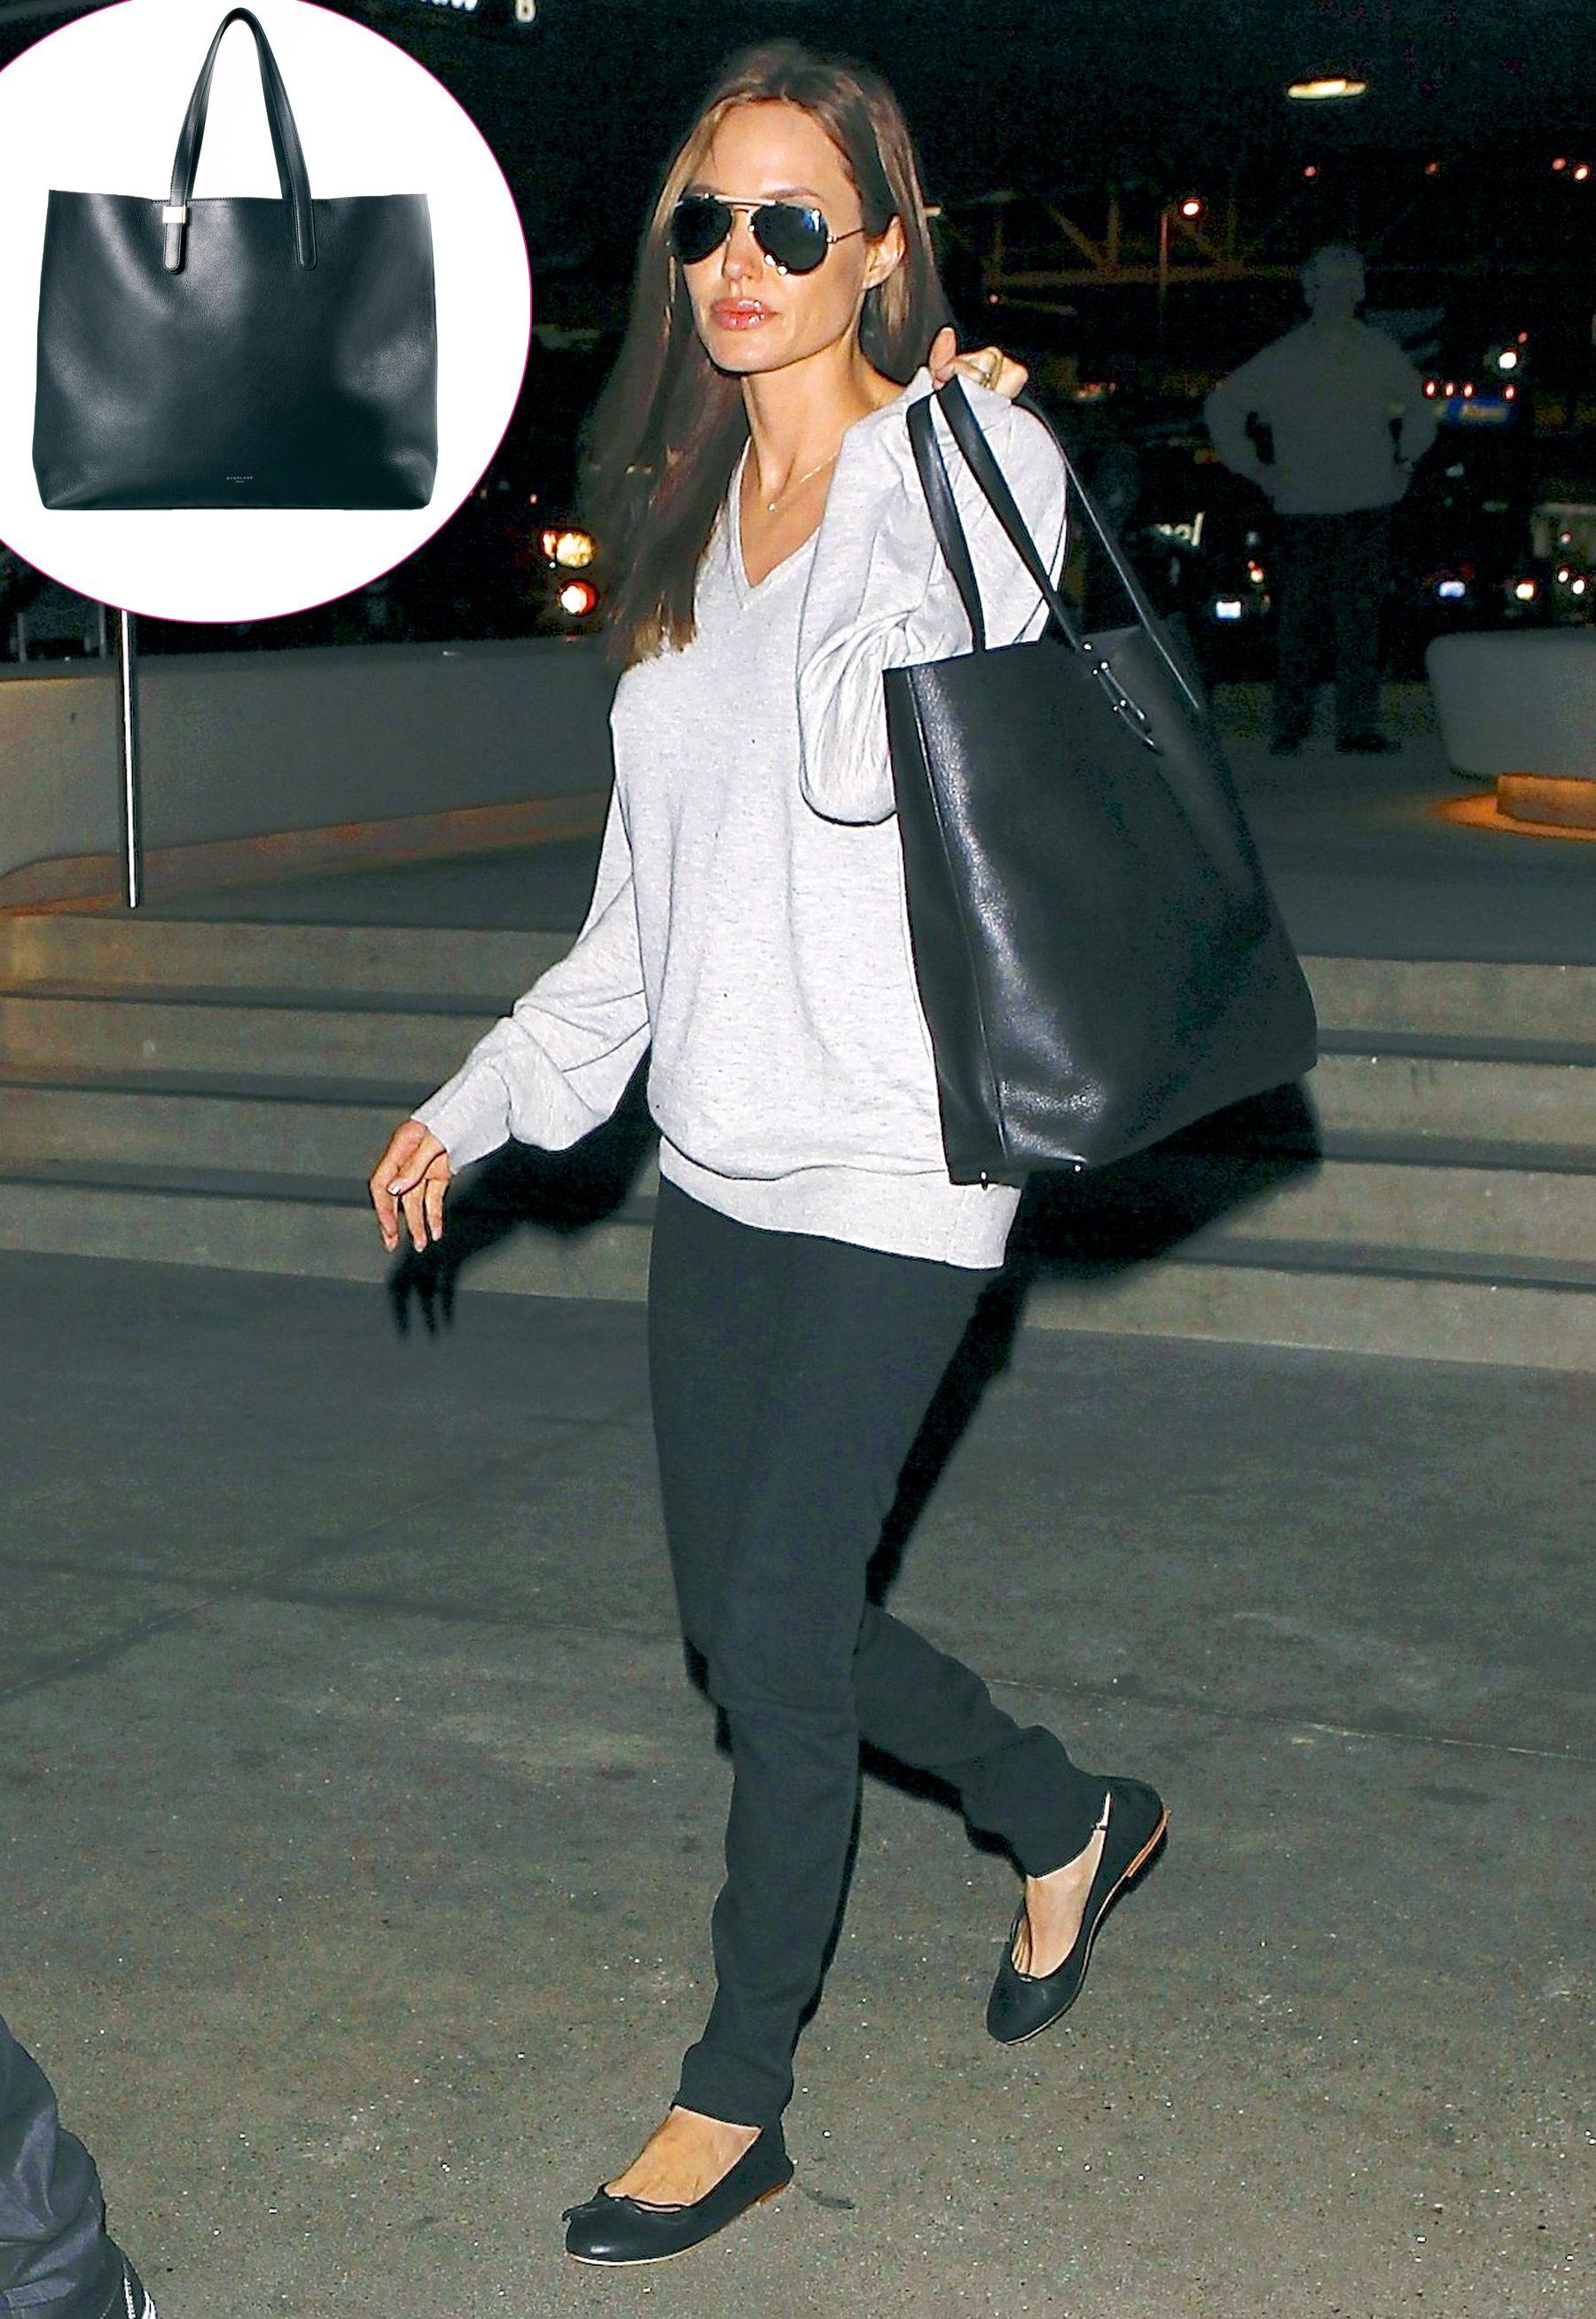 Angelina Jolie Street Style an Inspirational Diva Fashion   What I ... 8b967587c9f